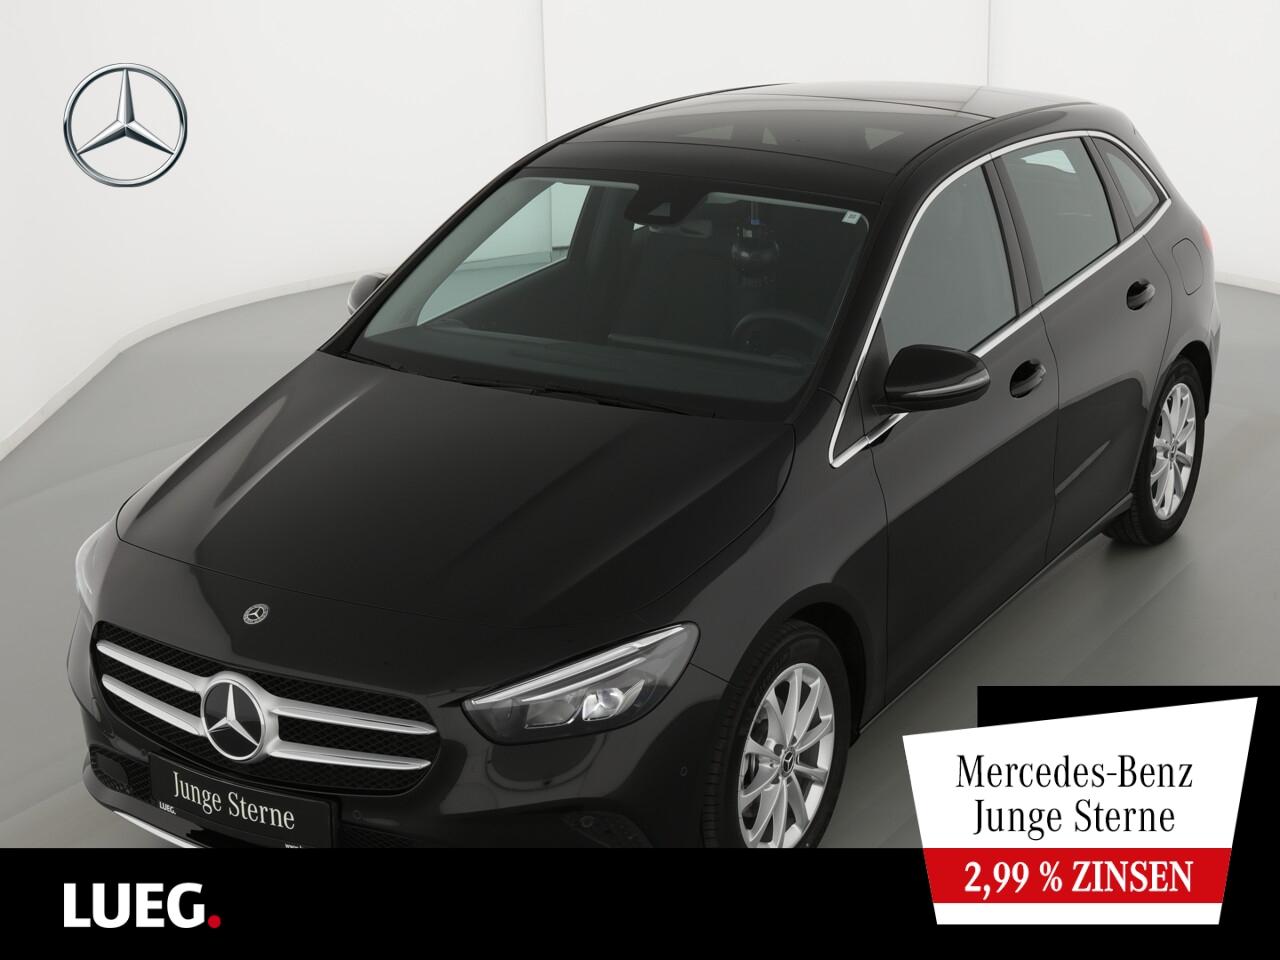 Mercedes-Benz B 180 d Progressive+MBUX+NavPrem+Pano+LED+Kamera, Jahr 2020, Diesel